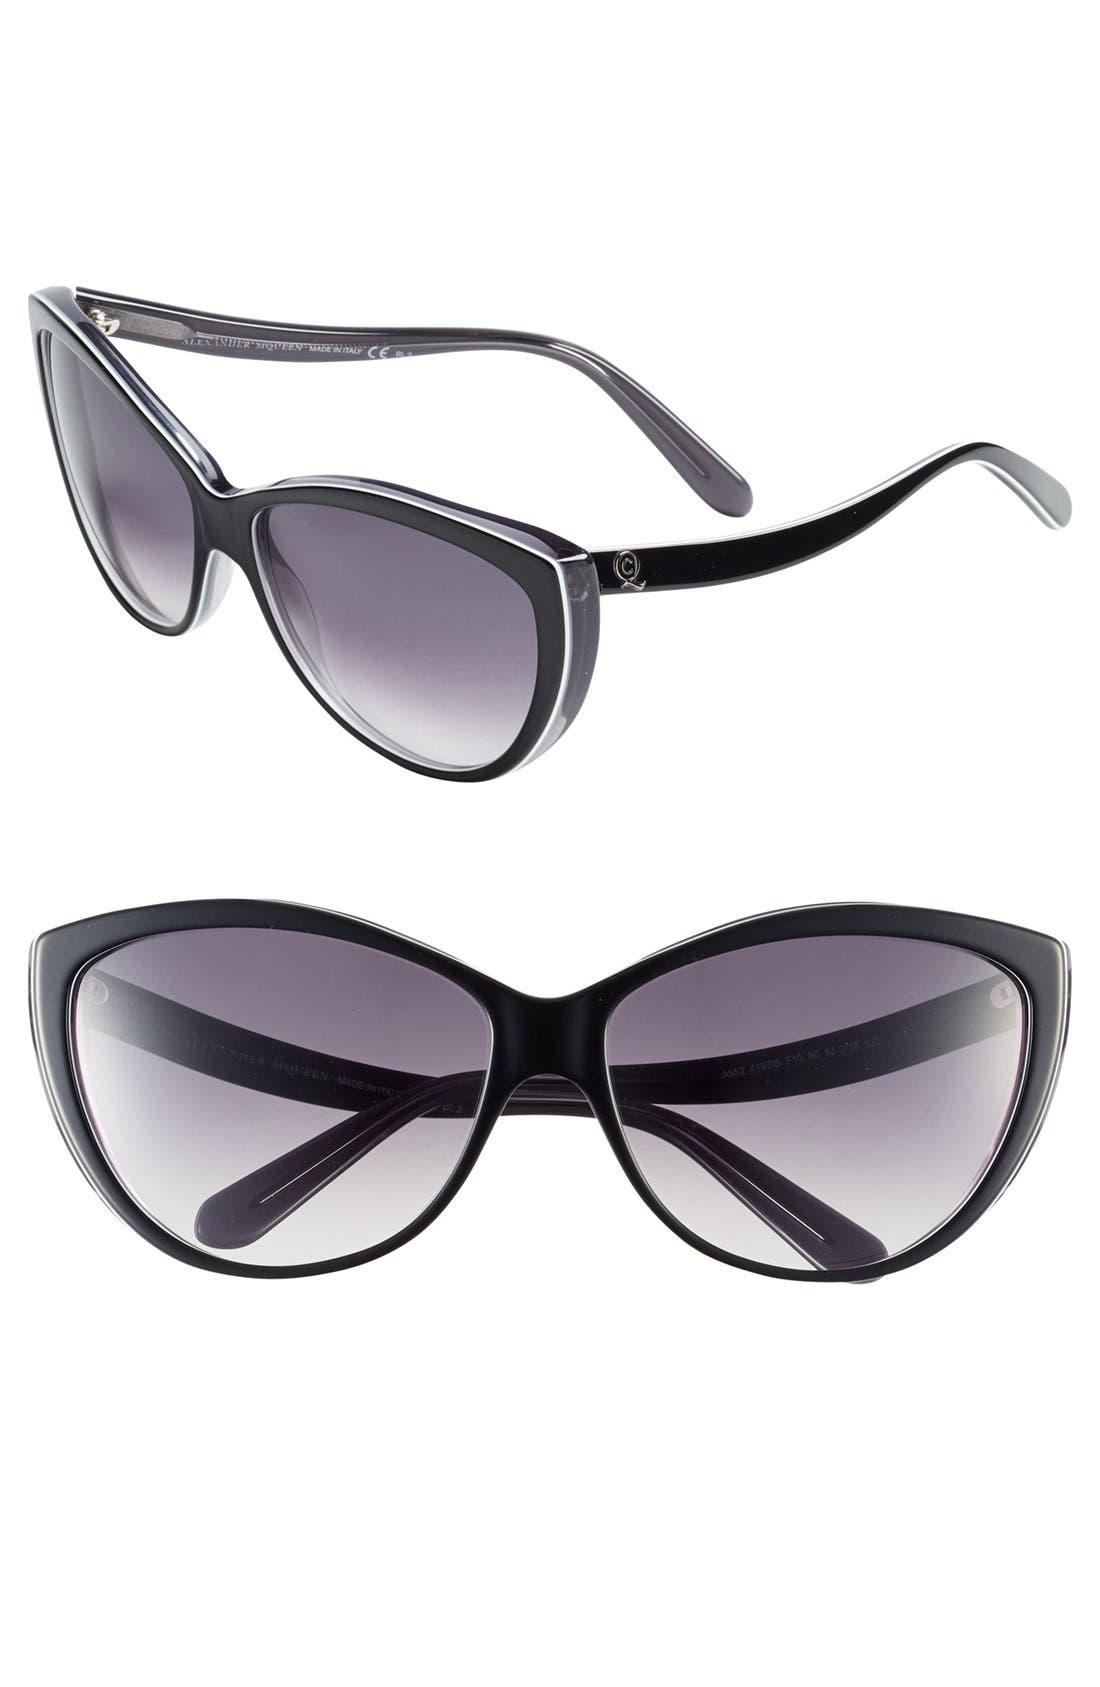 Main Image - Alexander McQueen 61mm Two-Tone Cat Eye Sunglasses